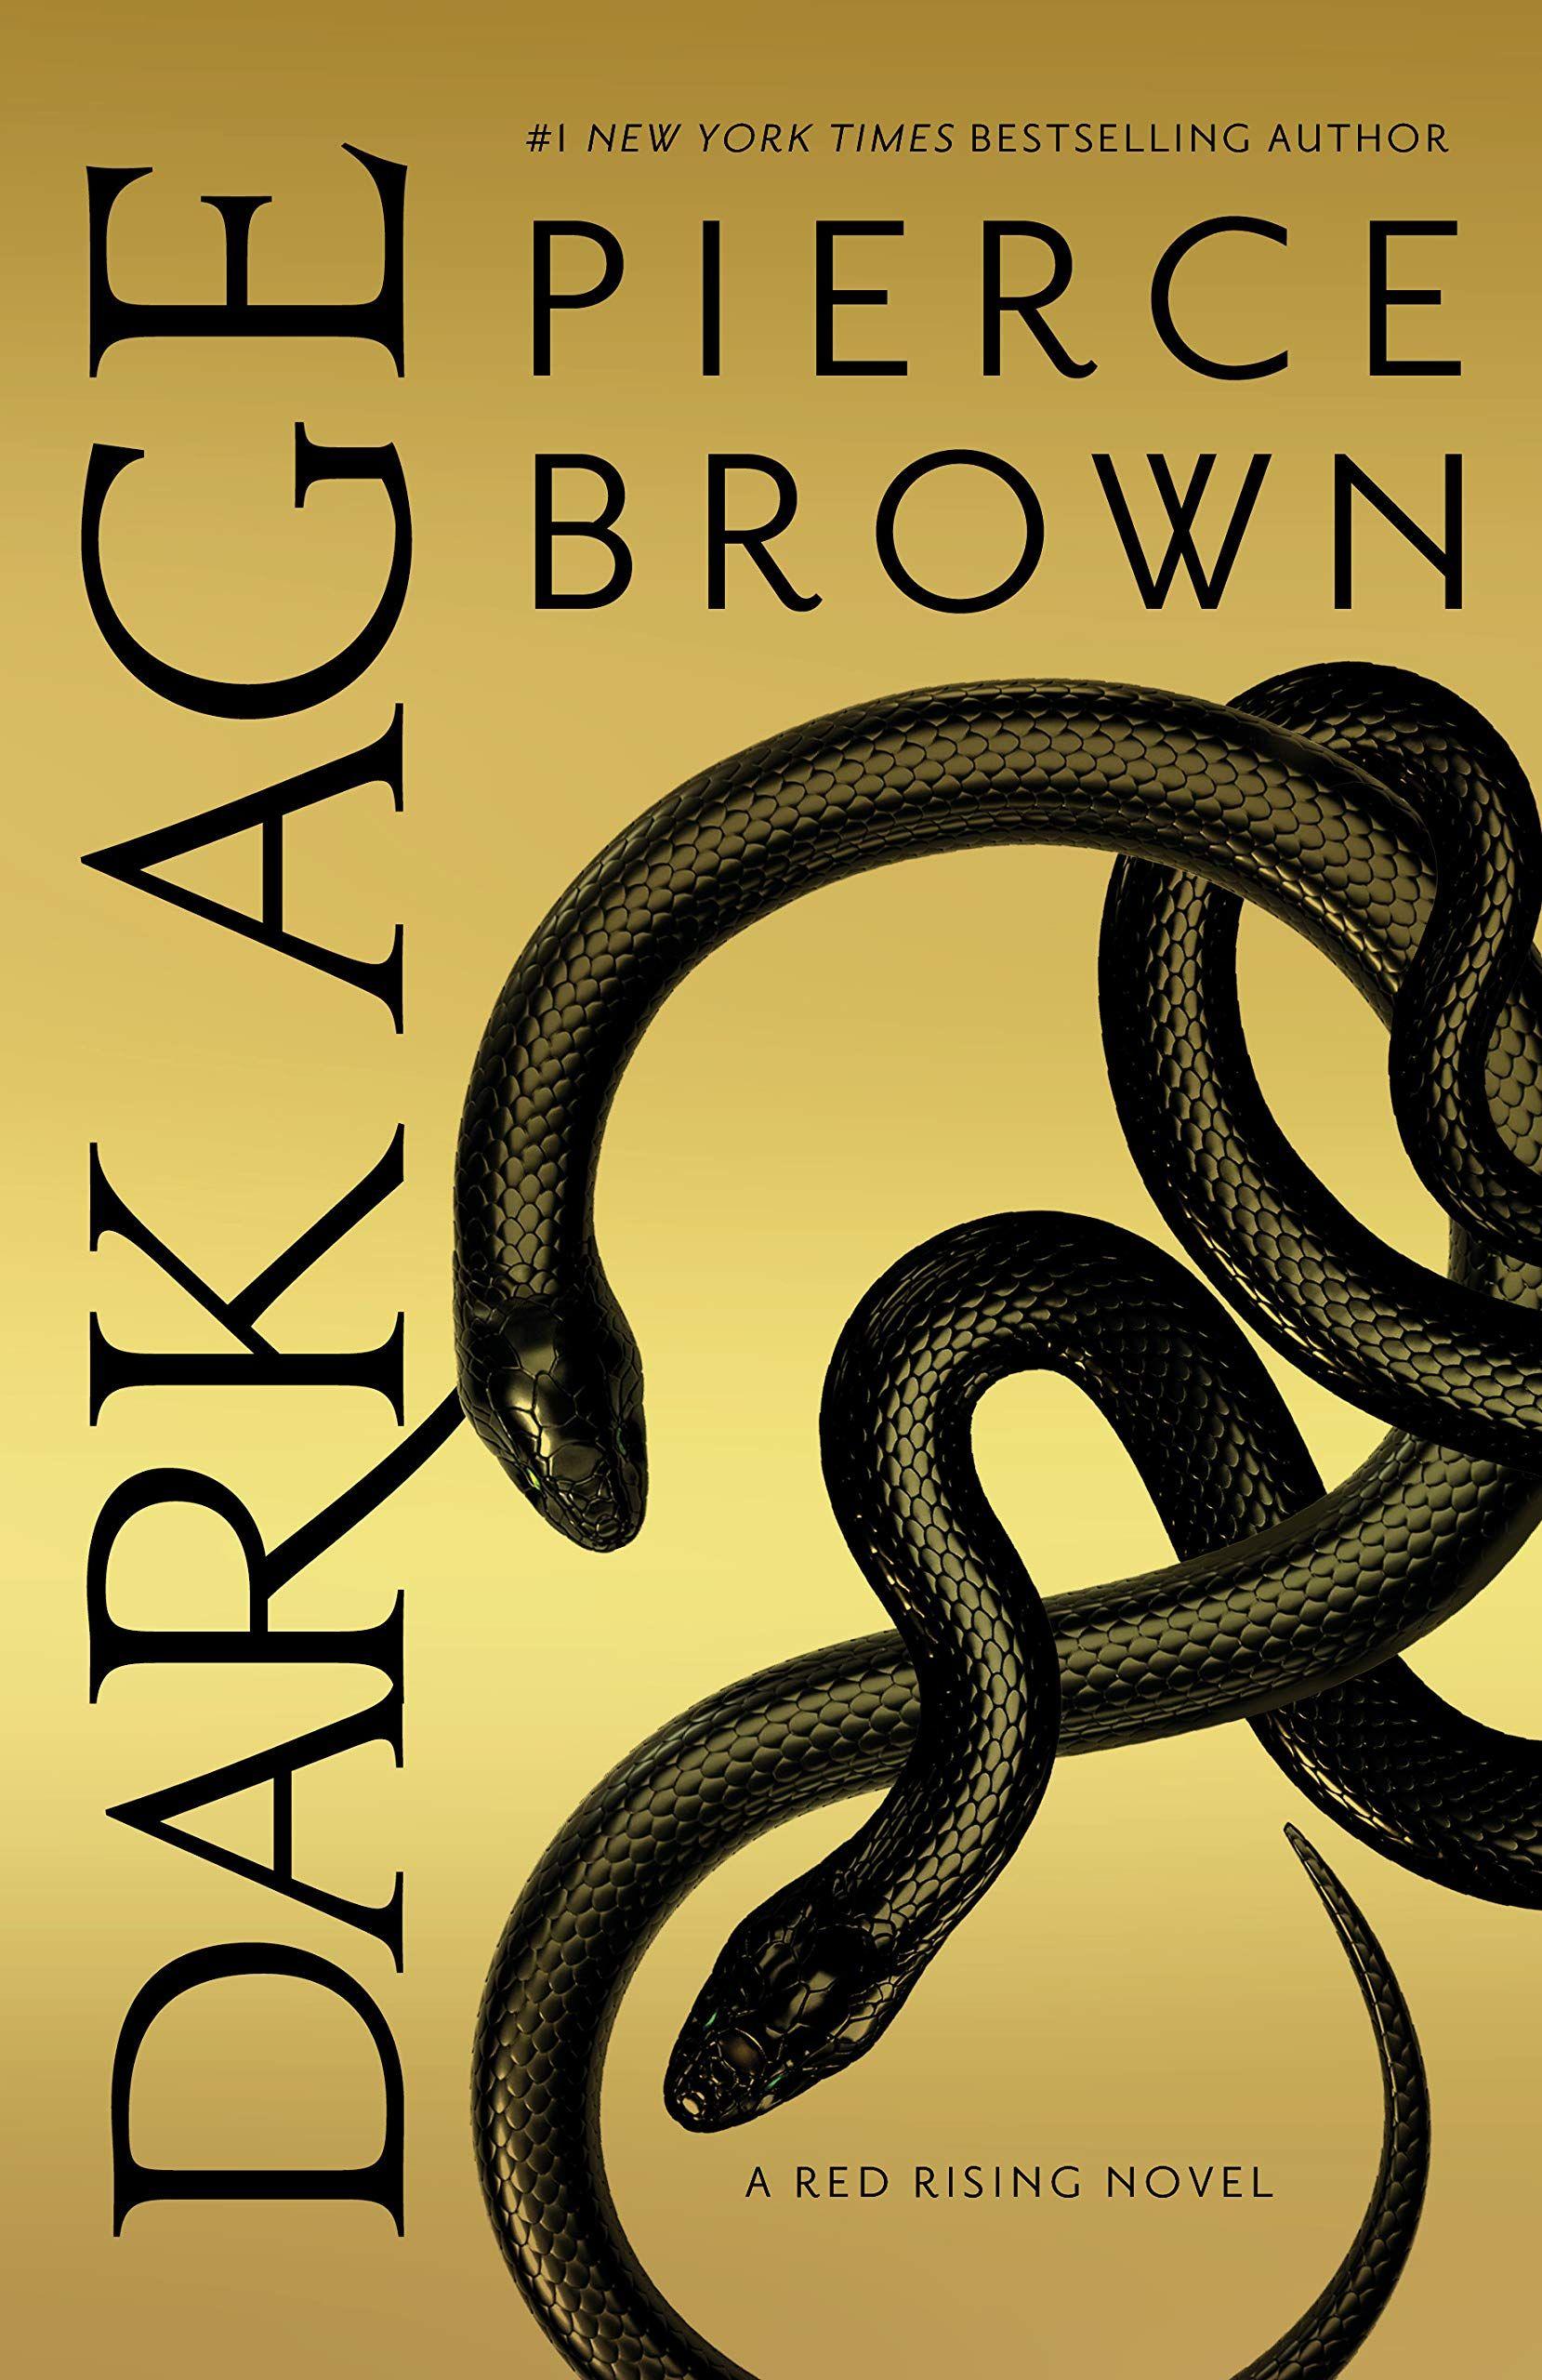 Dark Age By Pierce Brown 9780425285961 Penguinrandomhouse Com